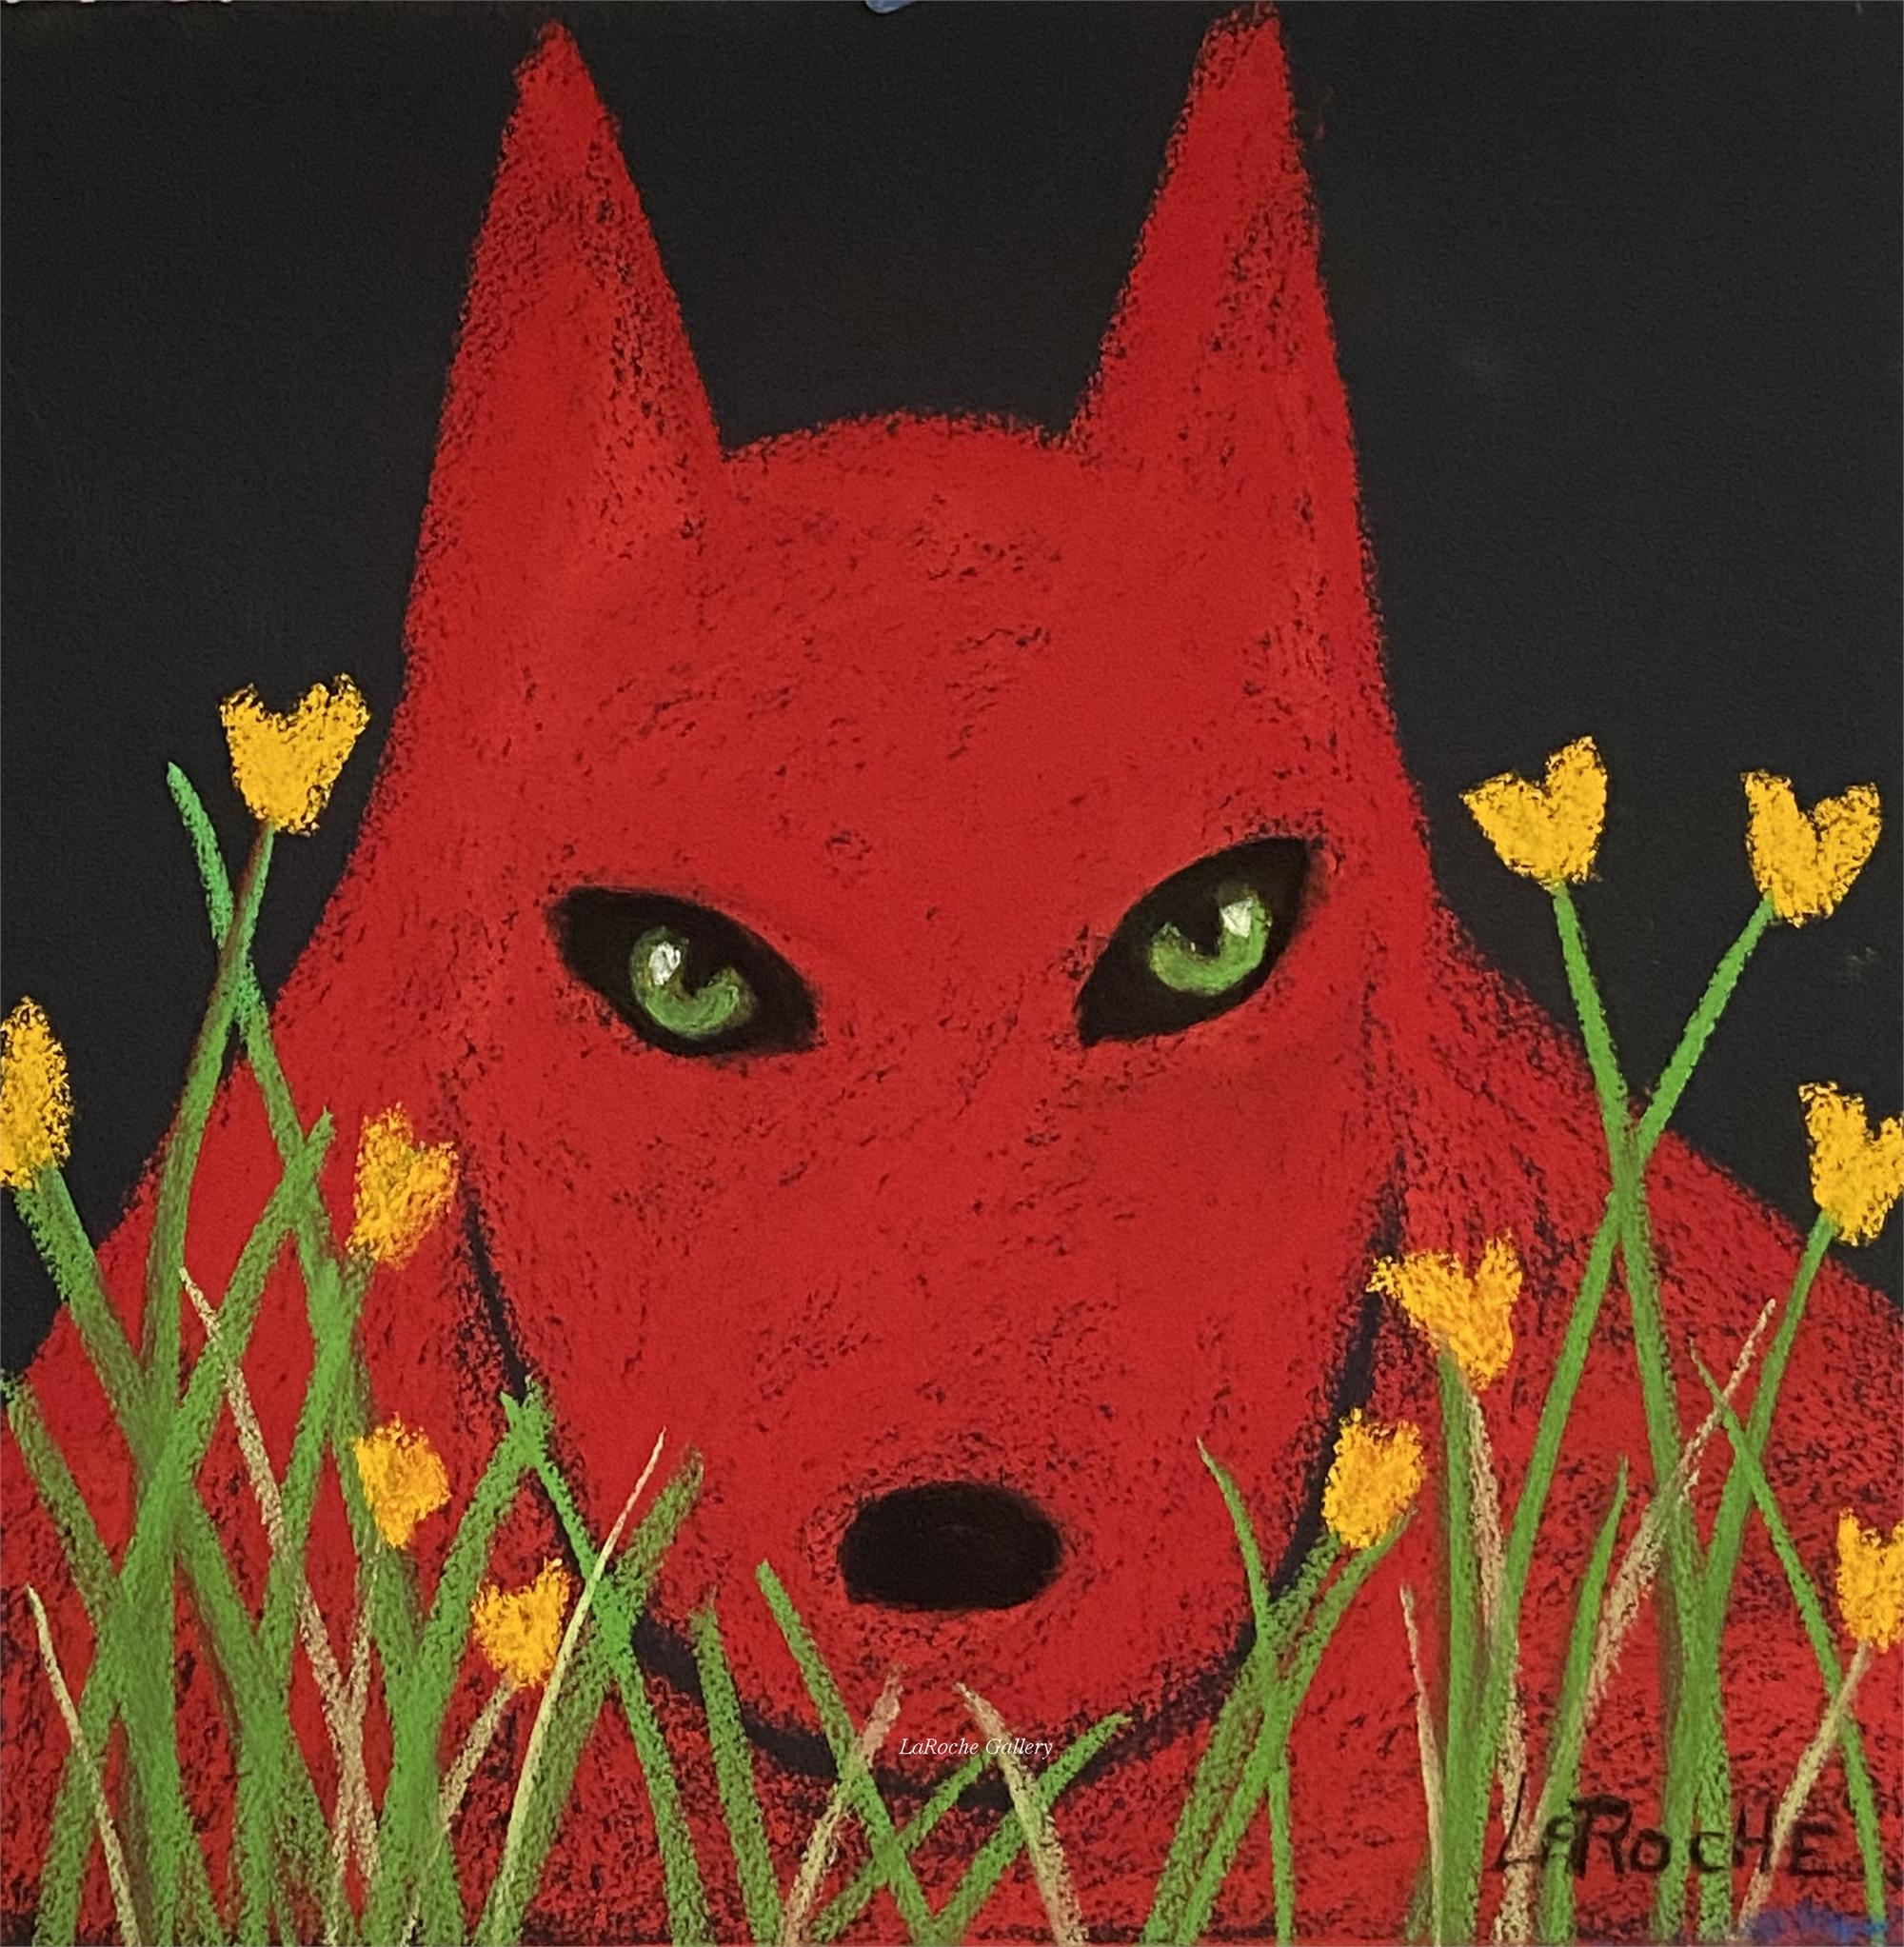 RED WOLF IN THE GARDEN by Carole LaRoche